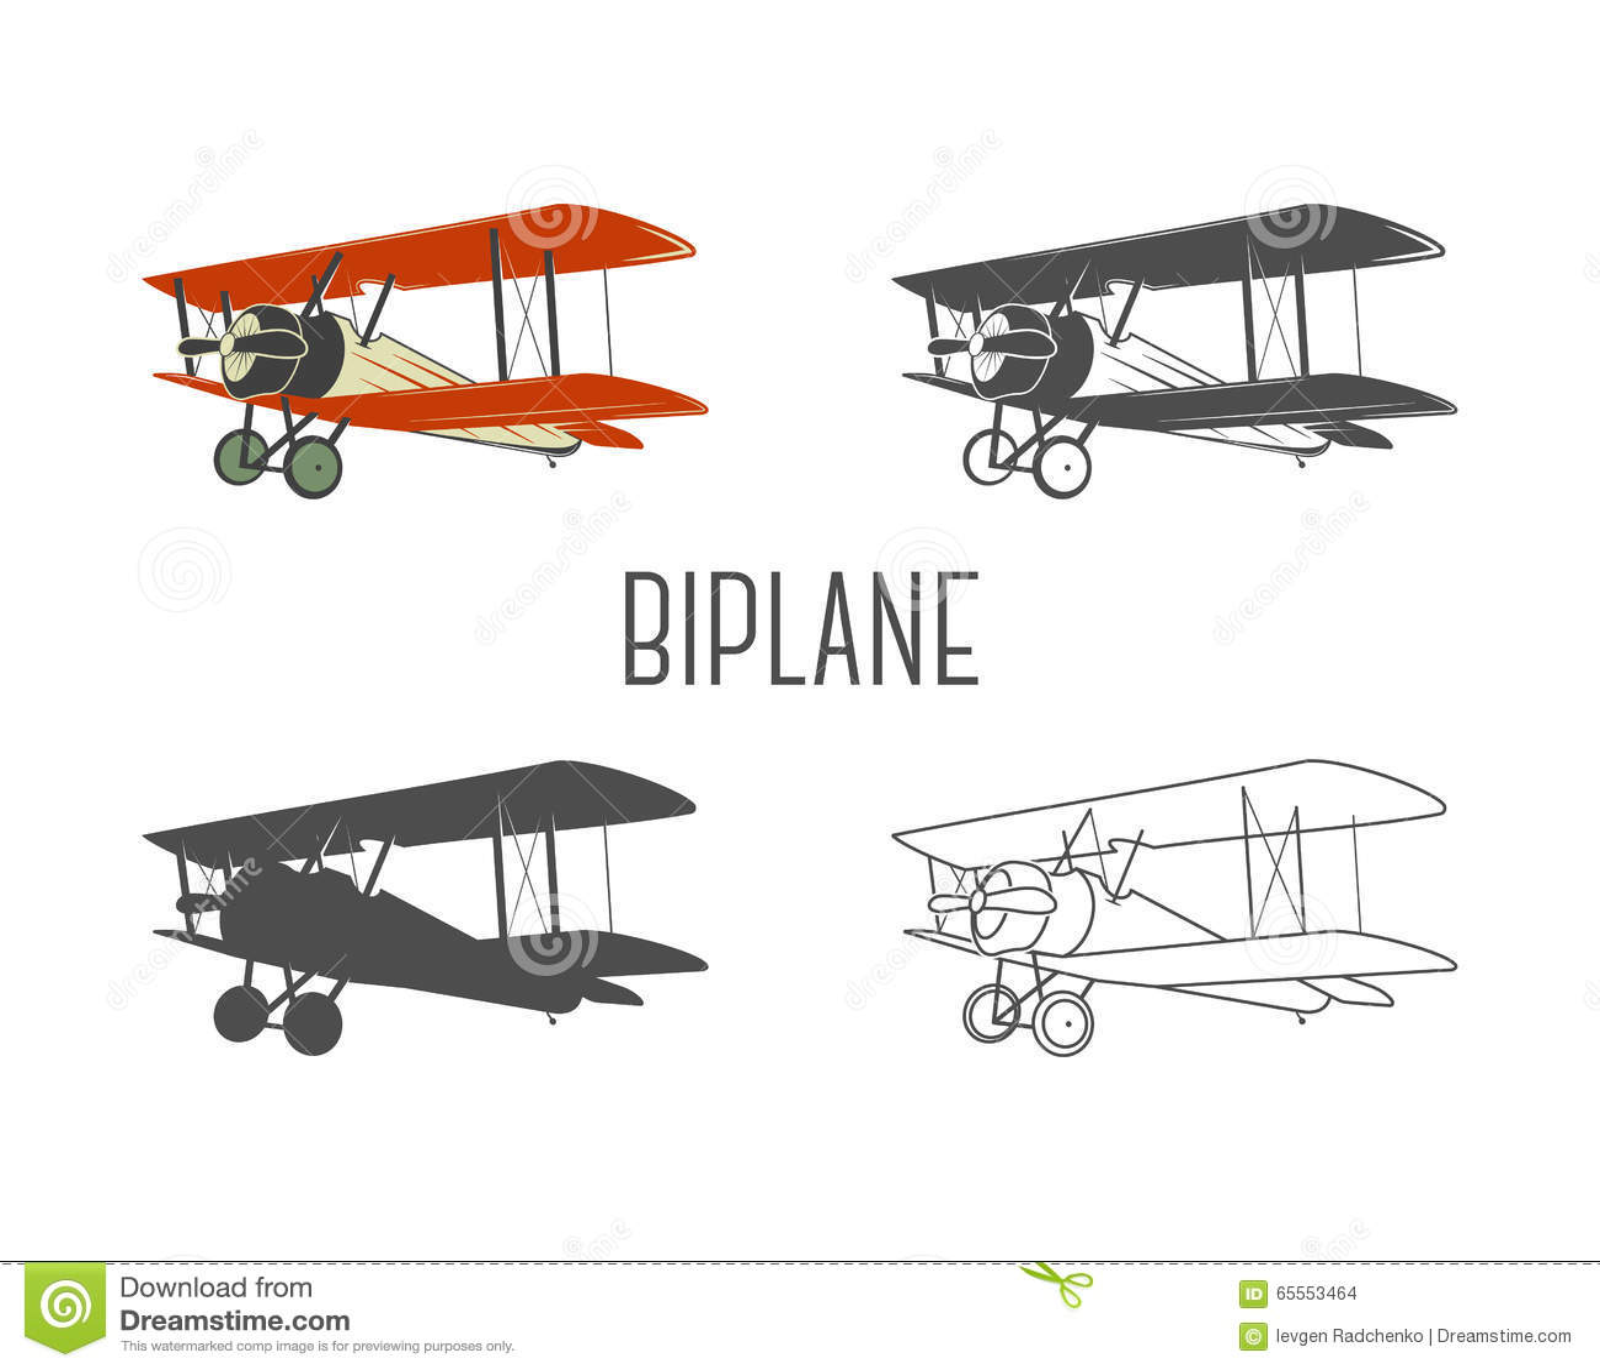 vintage airplane clipart - photo #45